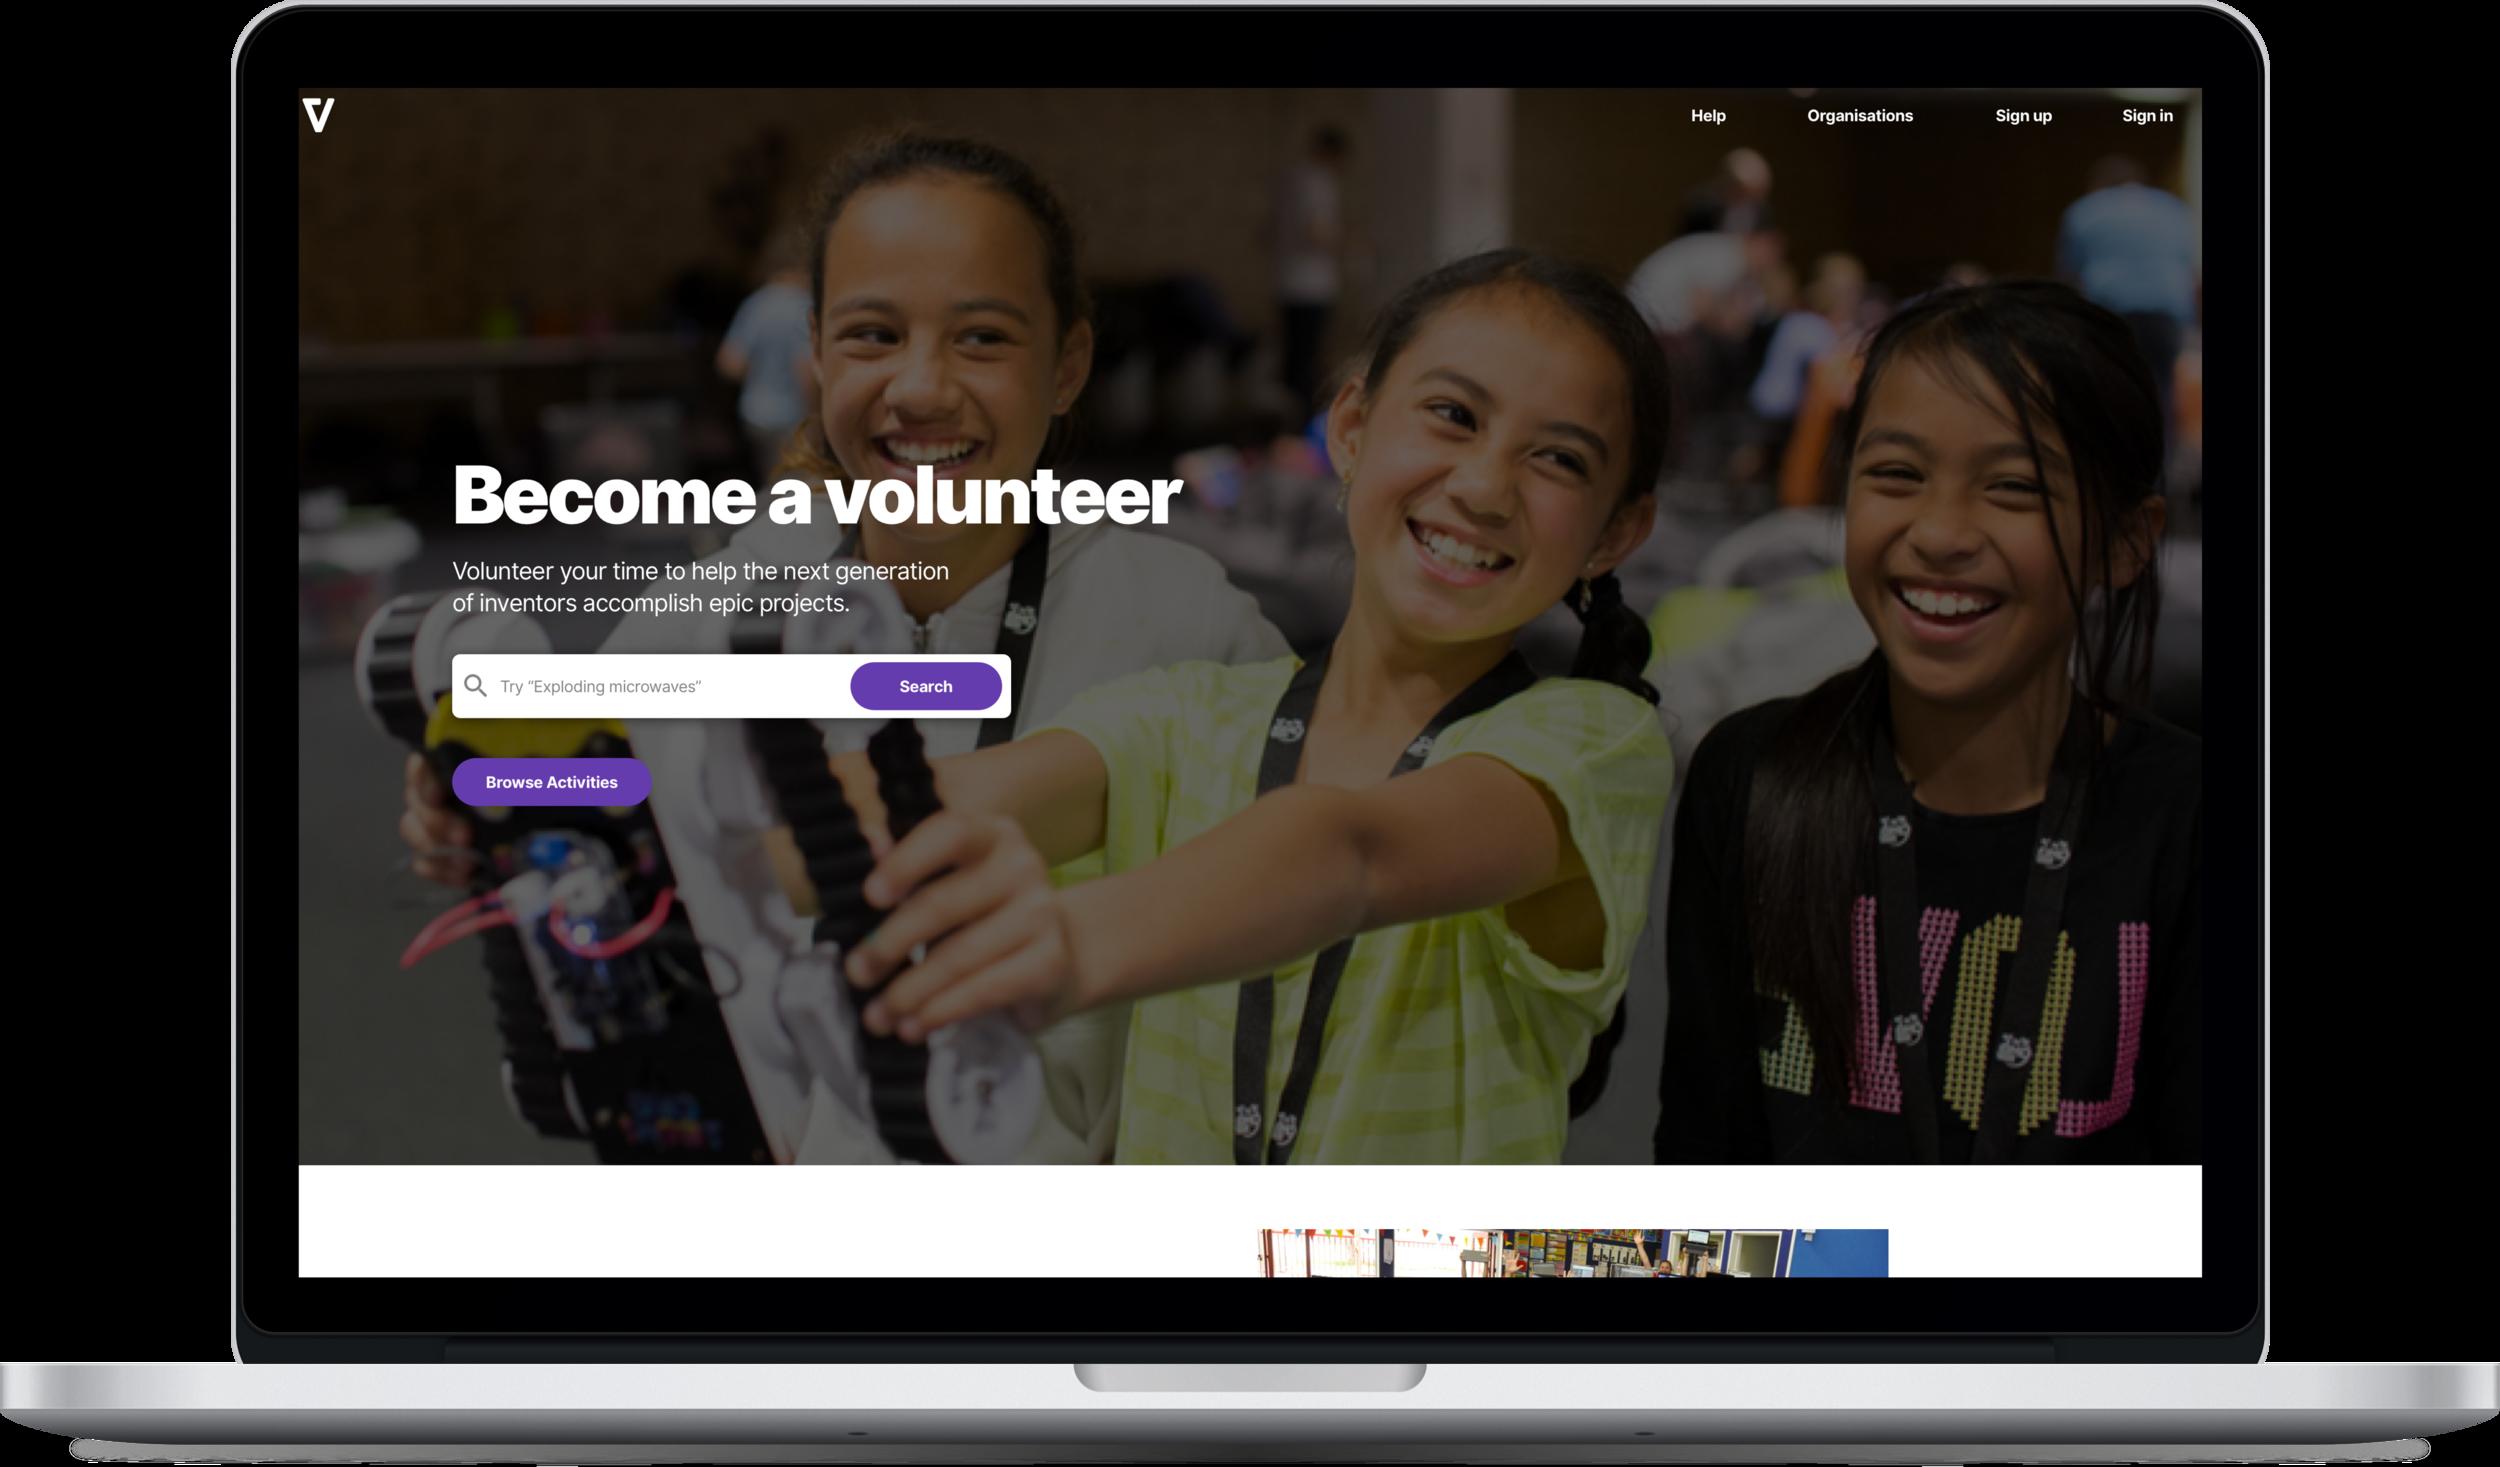 Voluntari.ly -